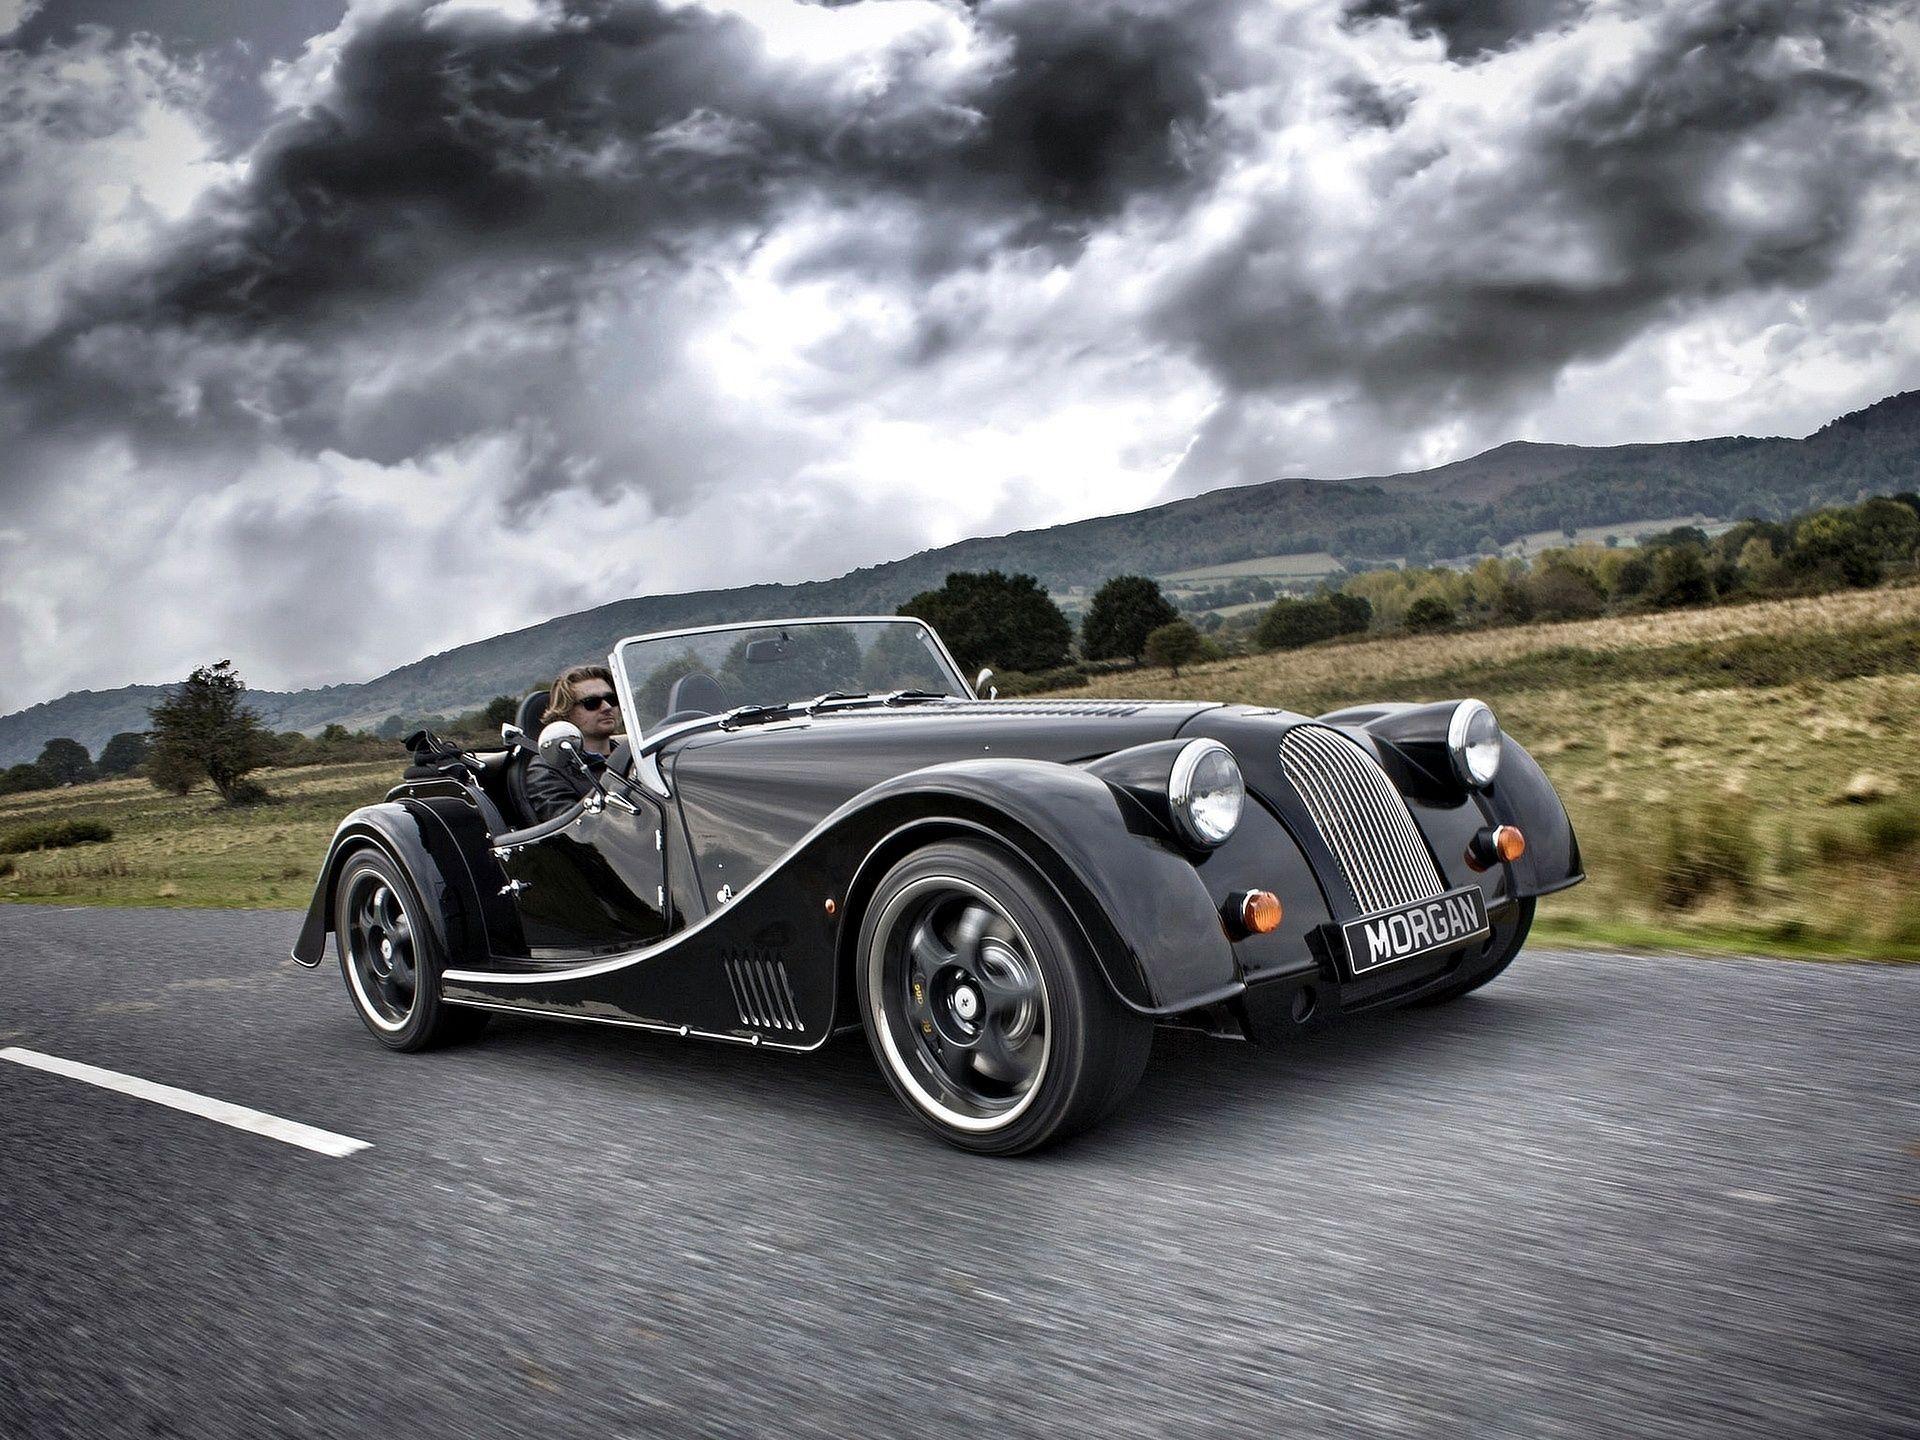 Morgan Plus 8 2013 | Morgan plus 8, Classic sports cars, Morgan cars